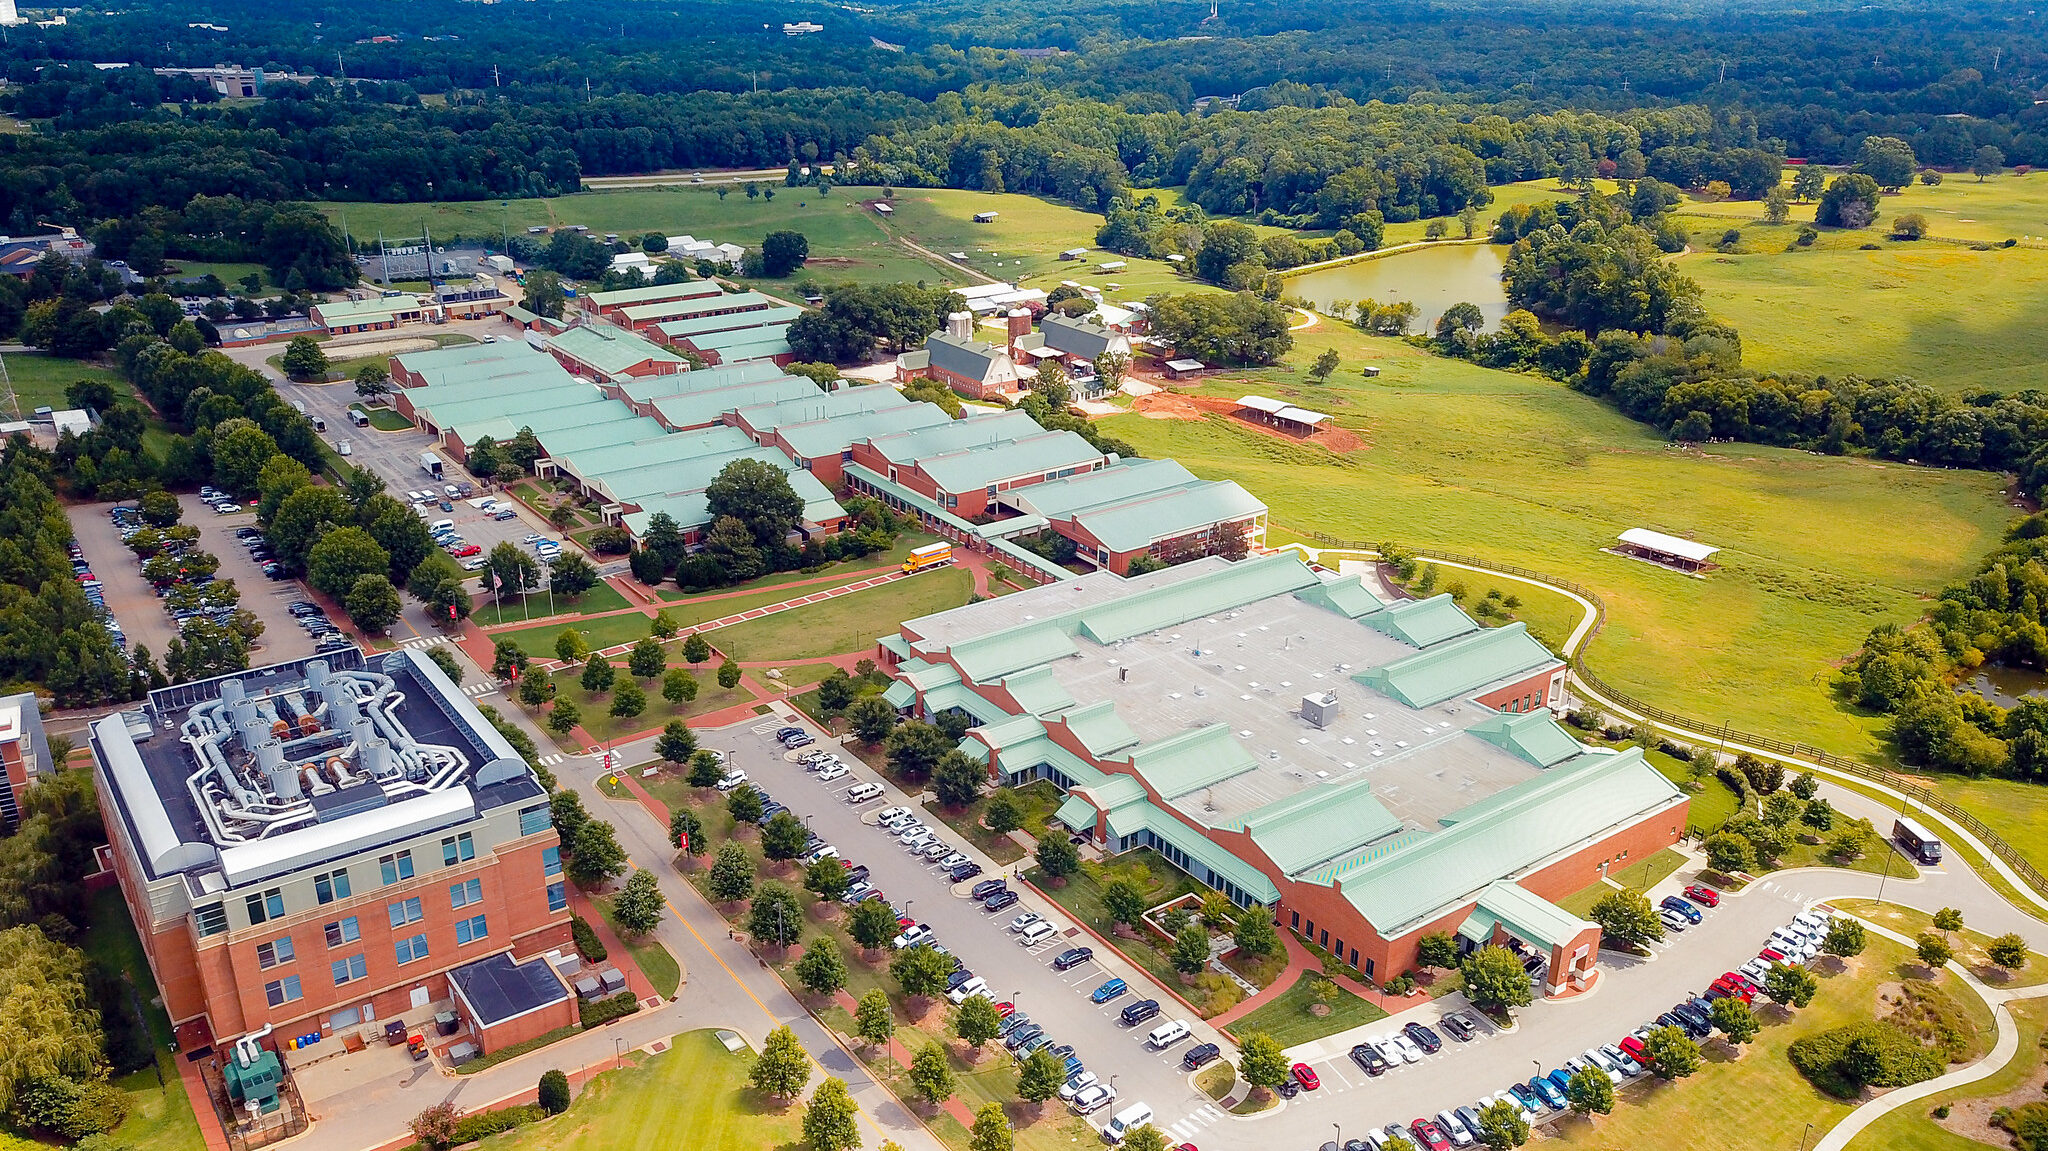 Aerial shot of Centennial Biomedical Campus